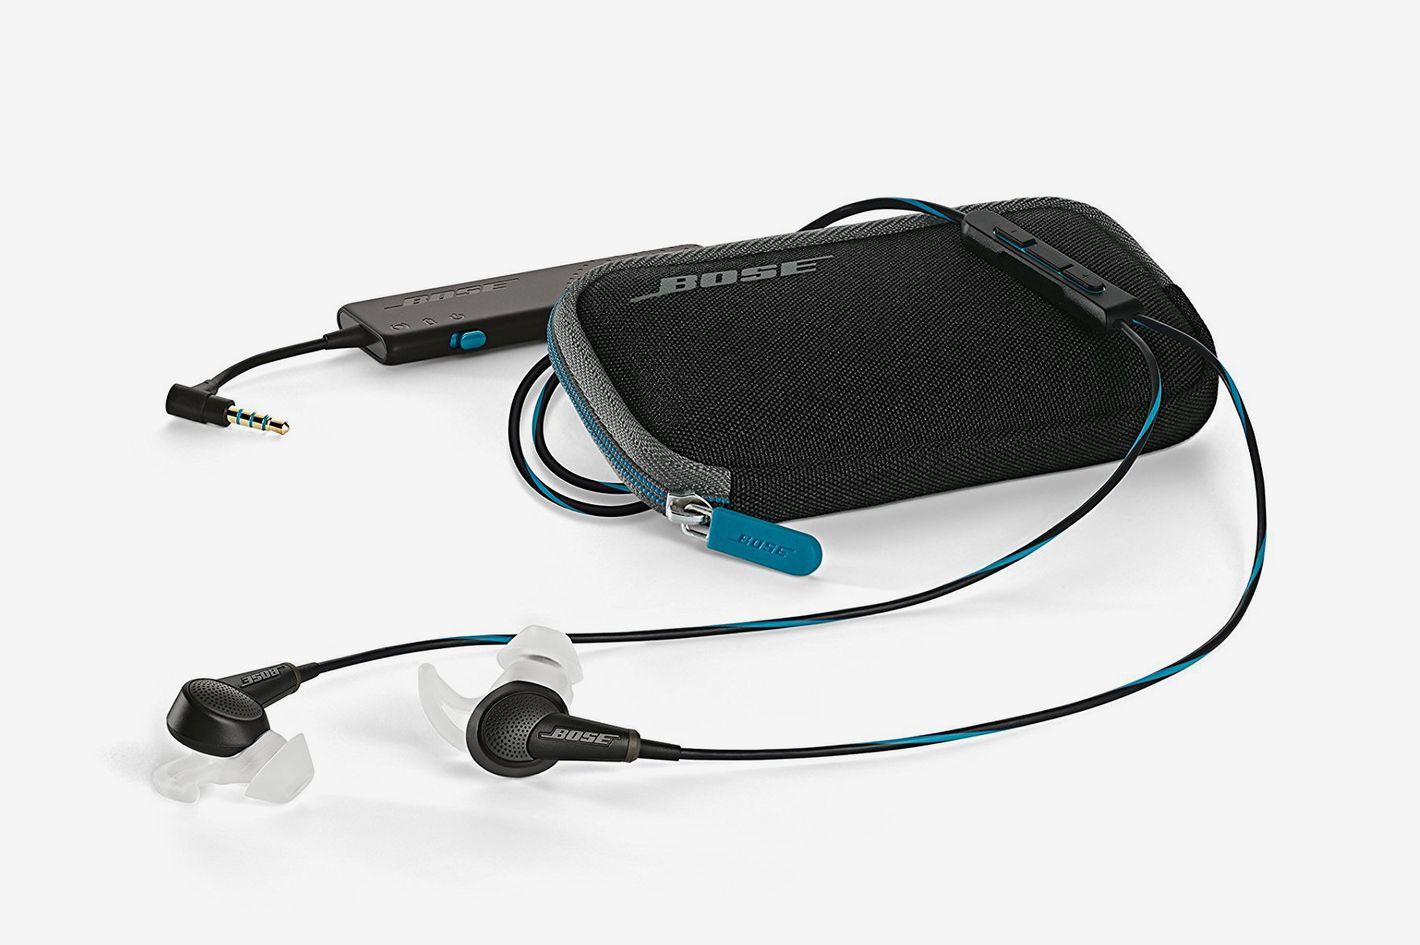 Bose QuietComfort 20 Acoustic Noise Cancelling Headphones, Apple Devices